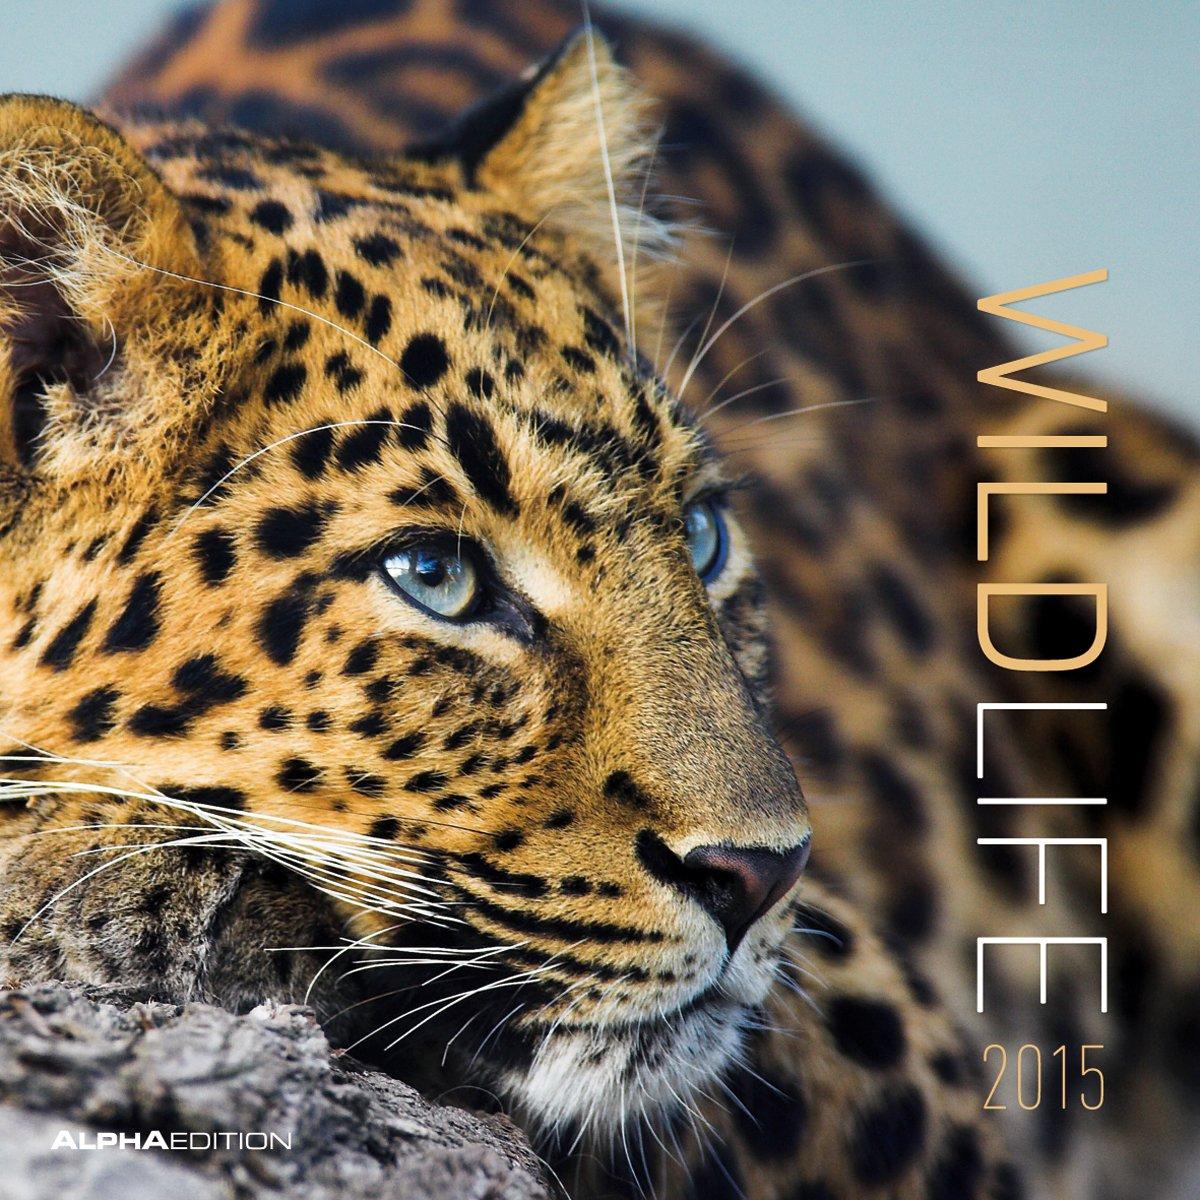 Wildlife 2015 - Broschürenkalender (30 x 60 geöffnet) - Tierkalender